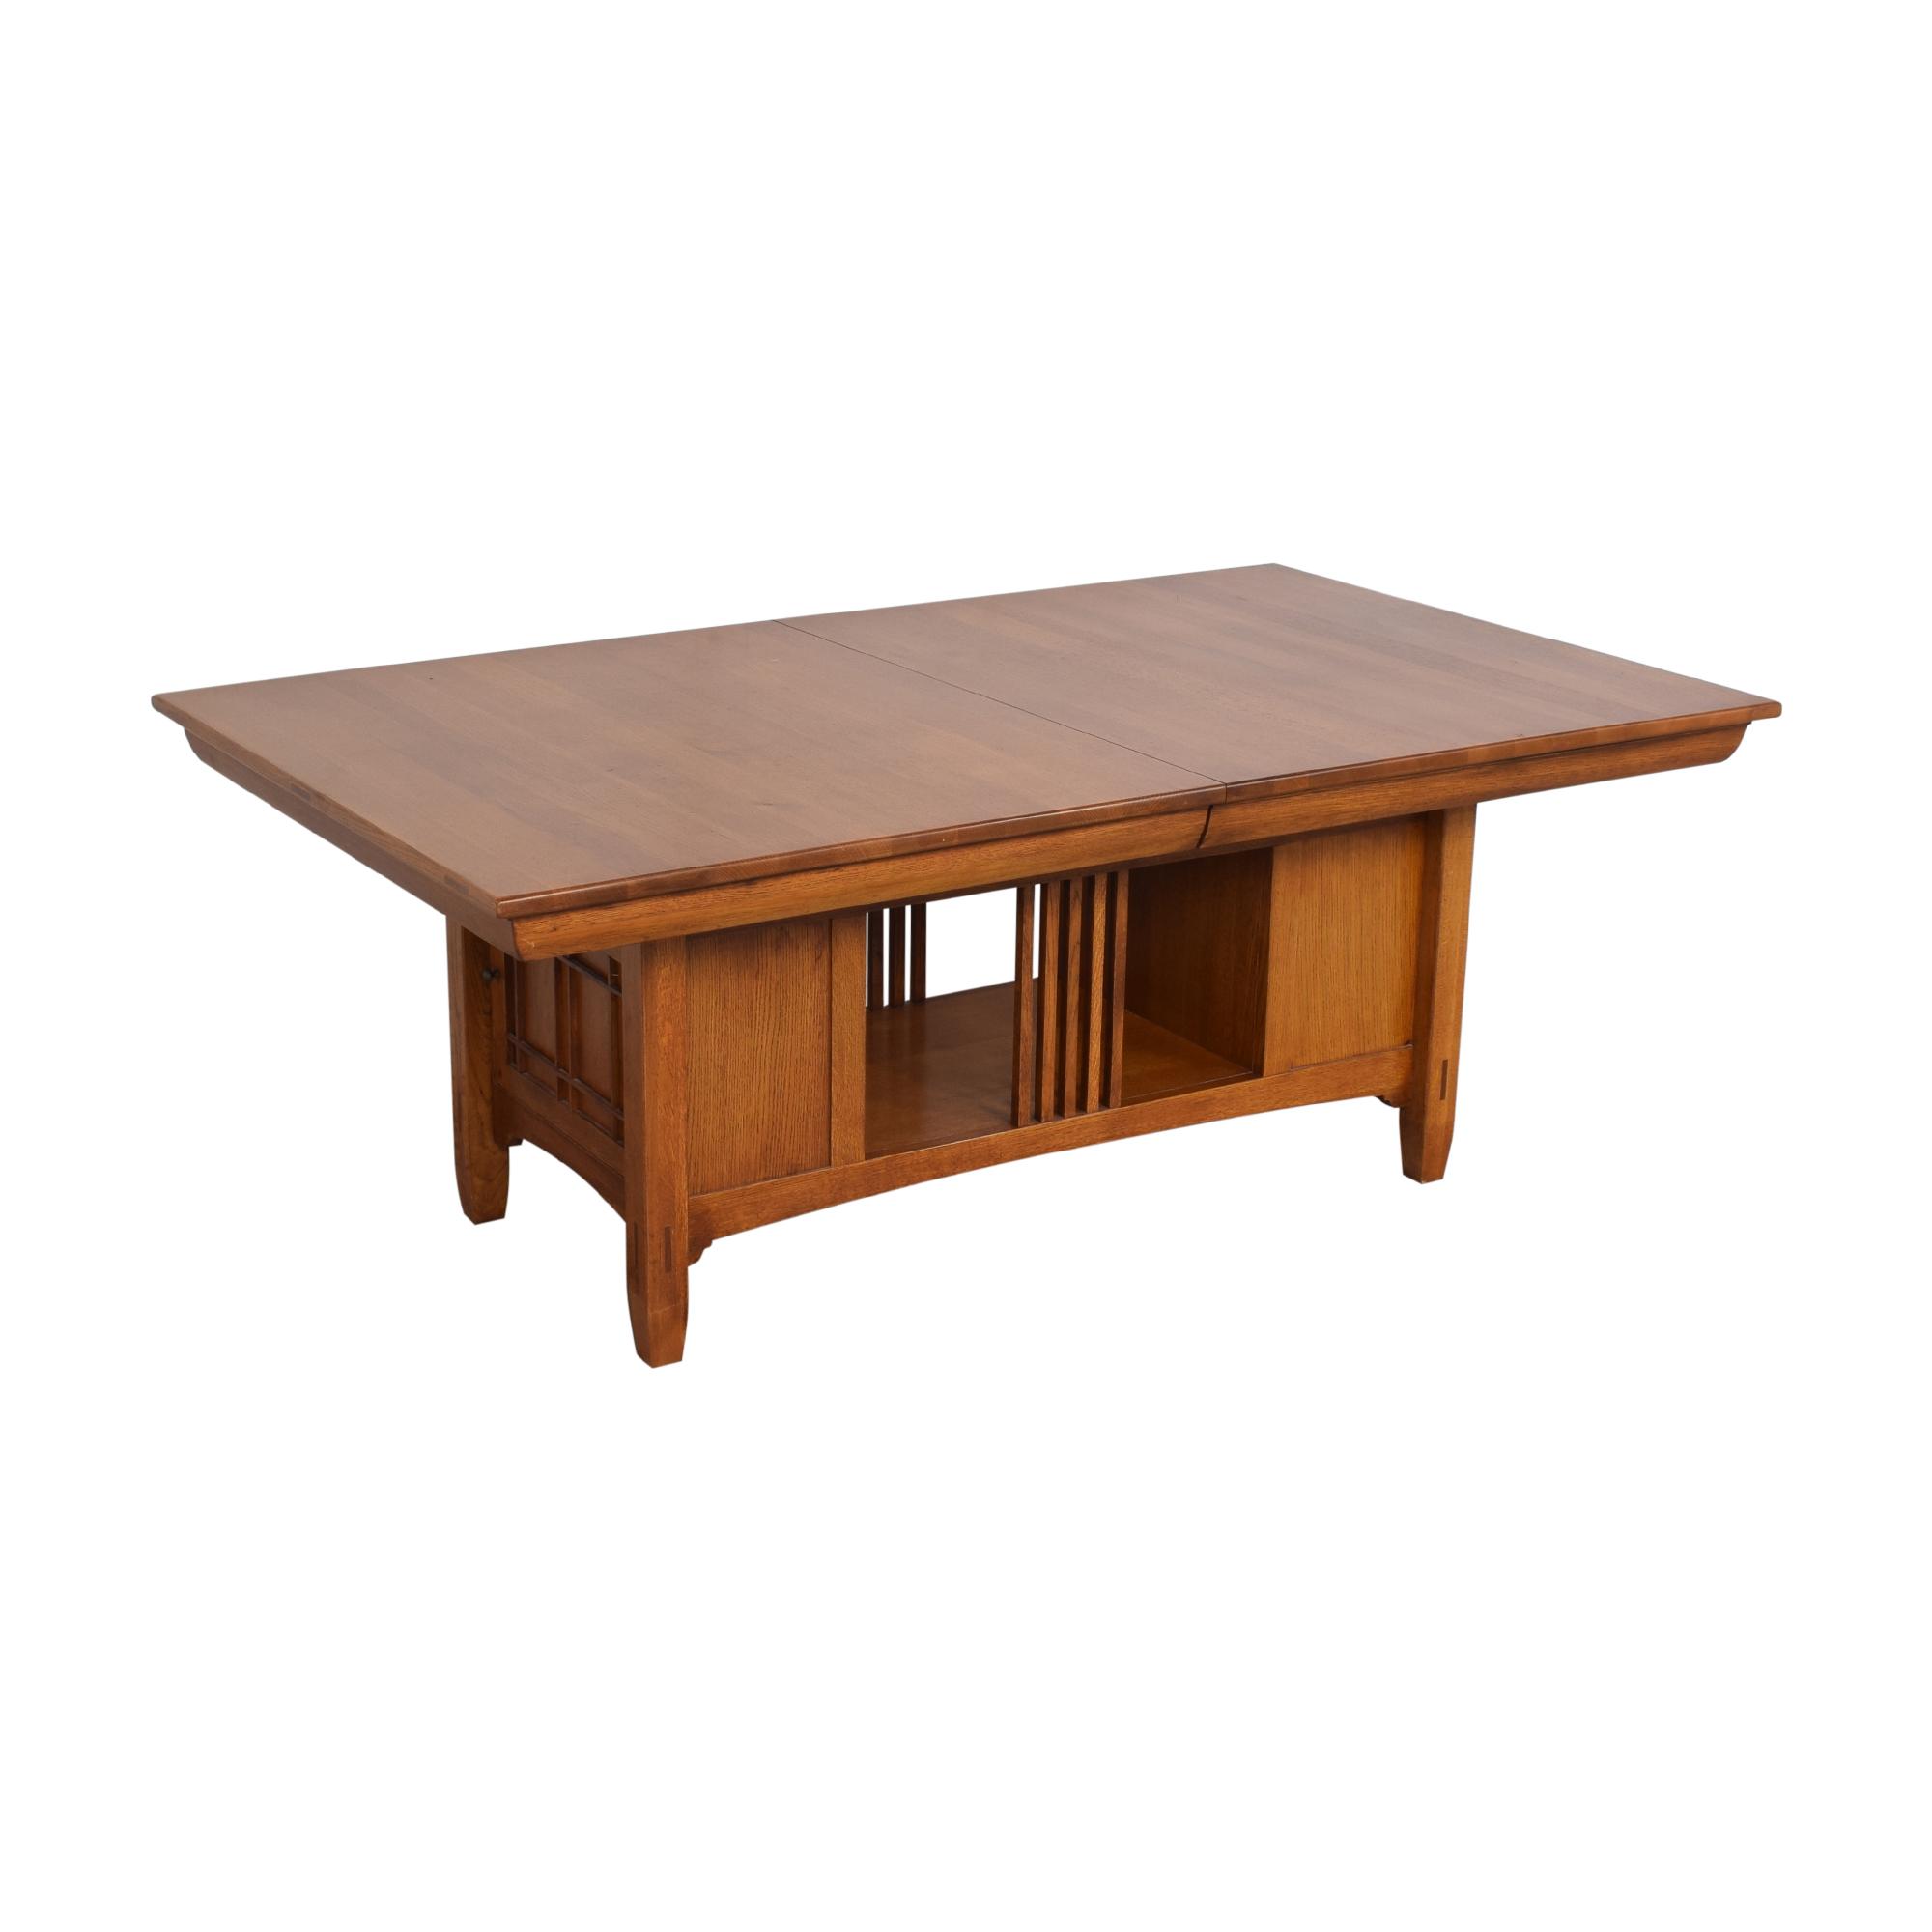 Lexington Furniture Lexington Bob Timberlake Arts & Crafts Collection Storage Dining Table discount